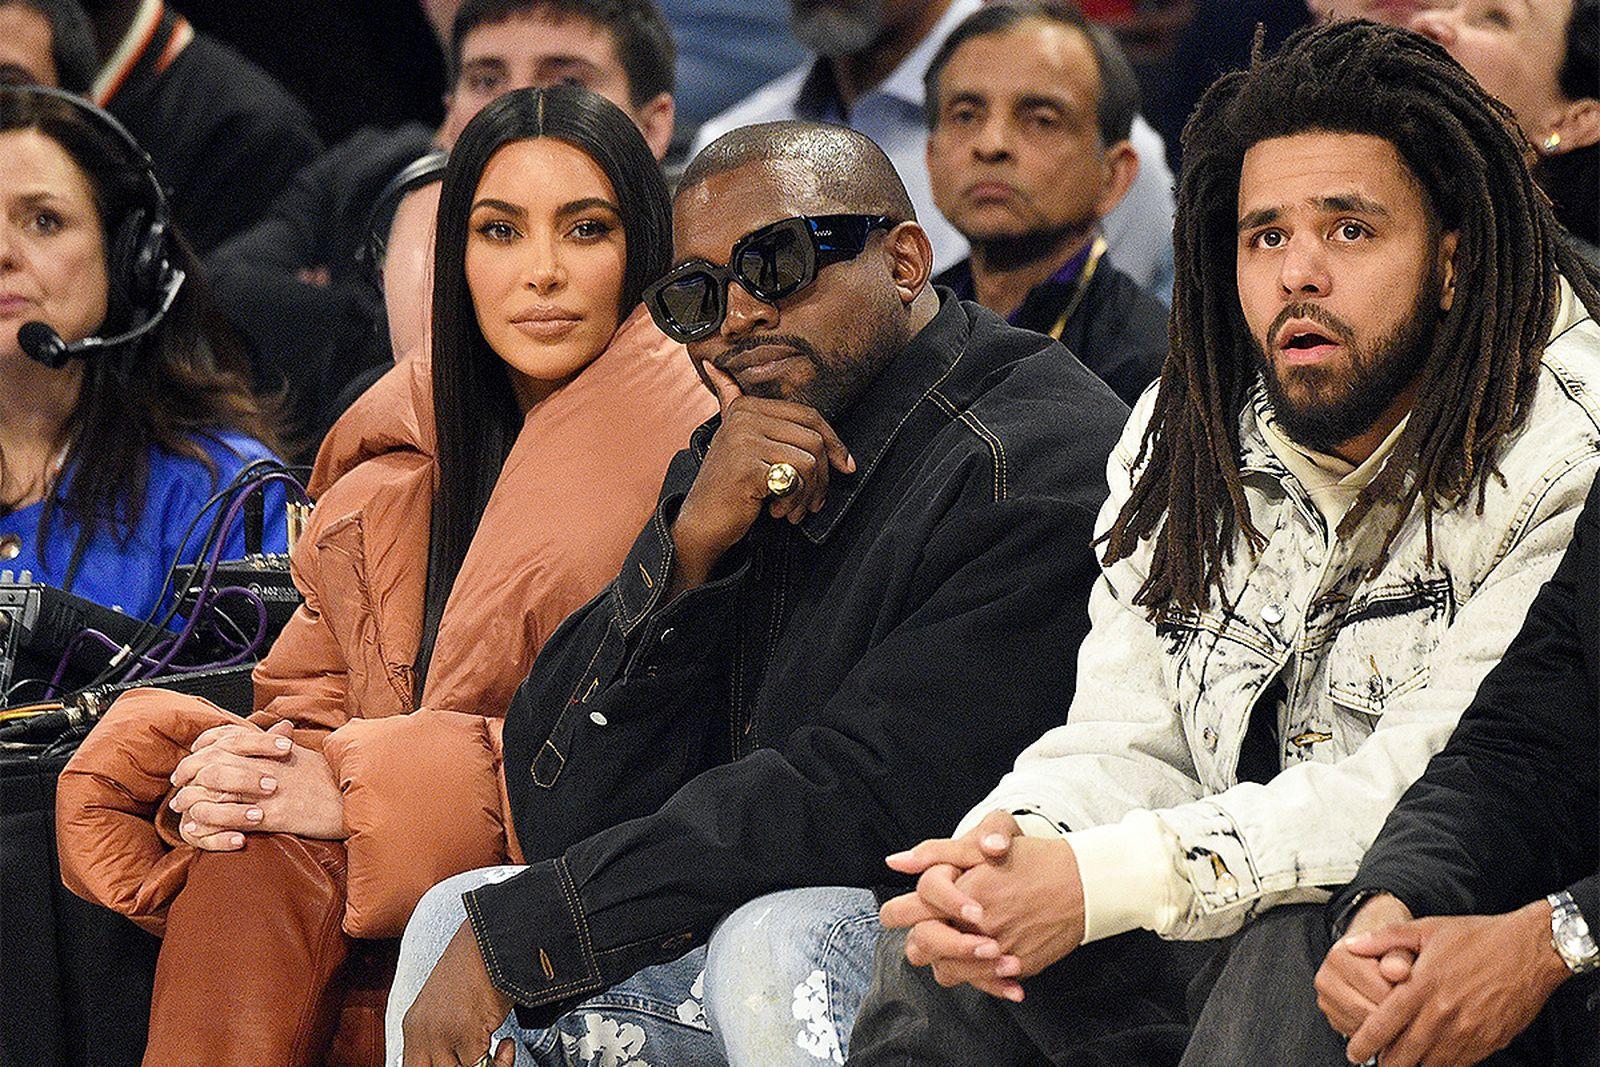 Kanye West, Kim Kardashian, nd J. Cole court-side NBA All-Star Game